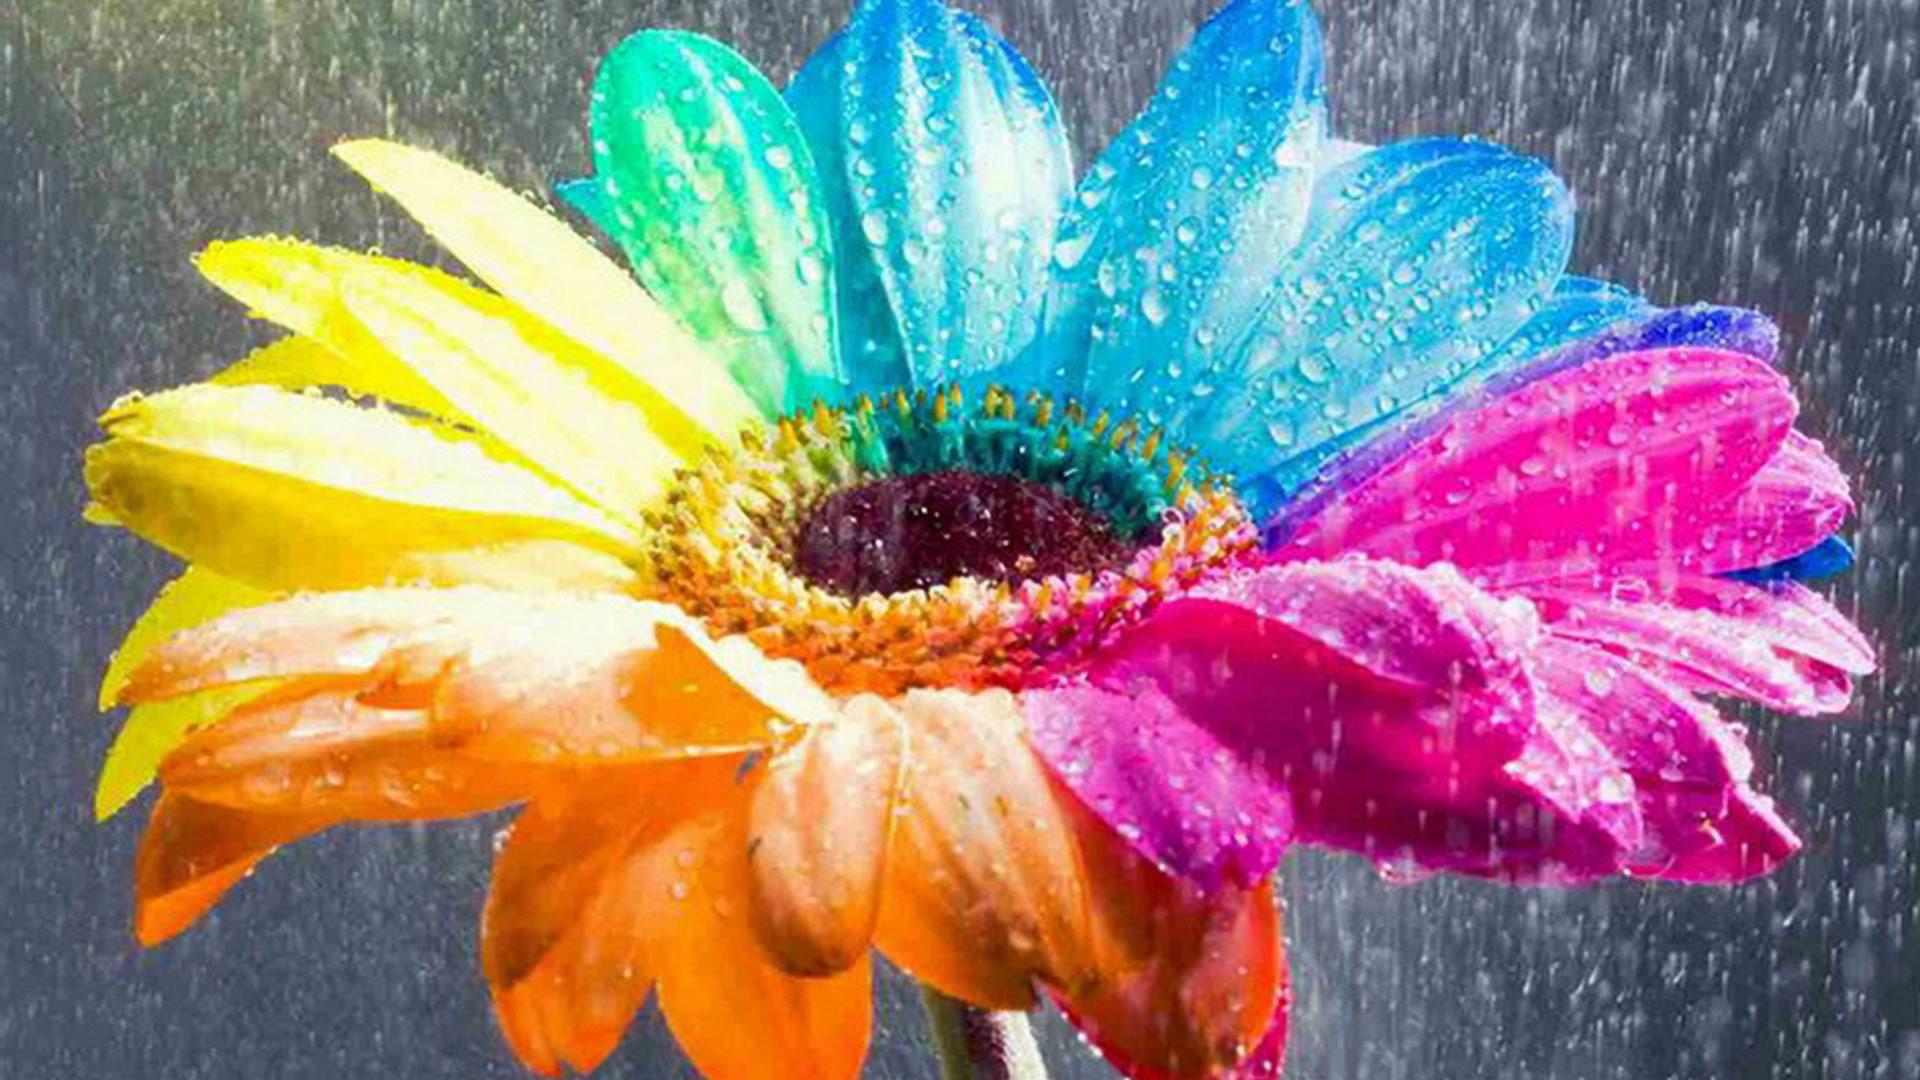 Description HD Flowers Wallpapers is a hi res Wallpaper for pc 1920x1080